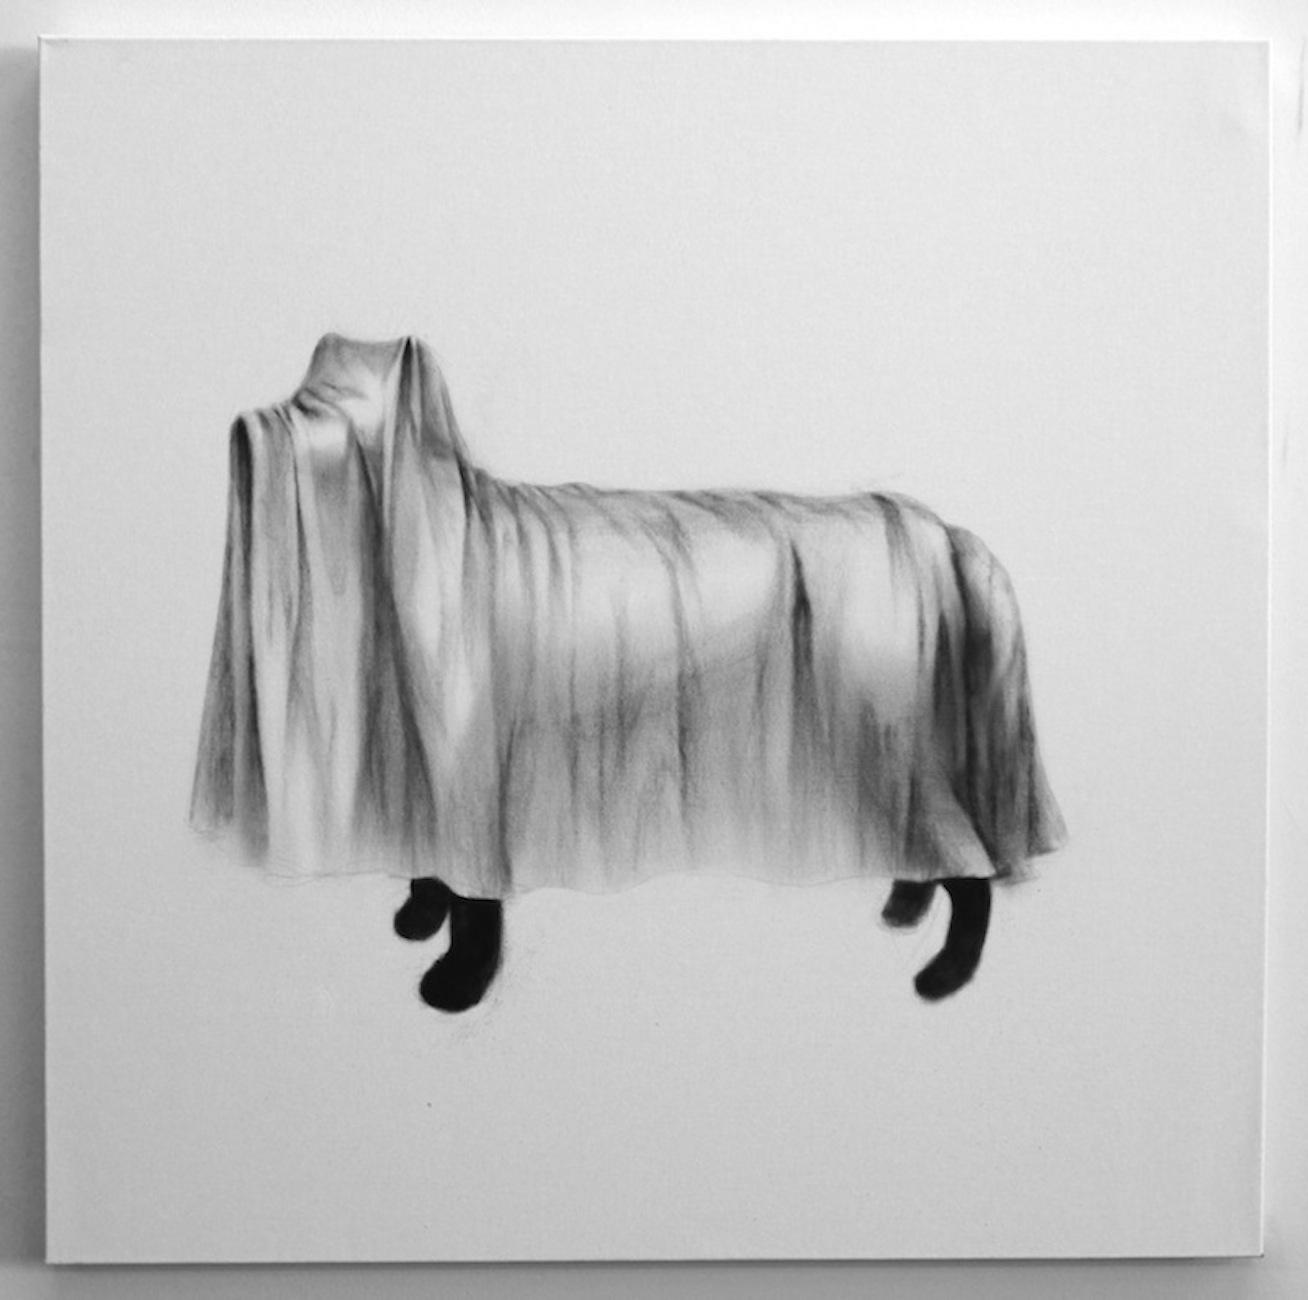 "Soo Shin\ Blind\ oil color on canvas\ h34xw34""\ 2012"